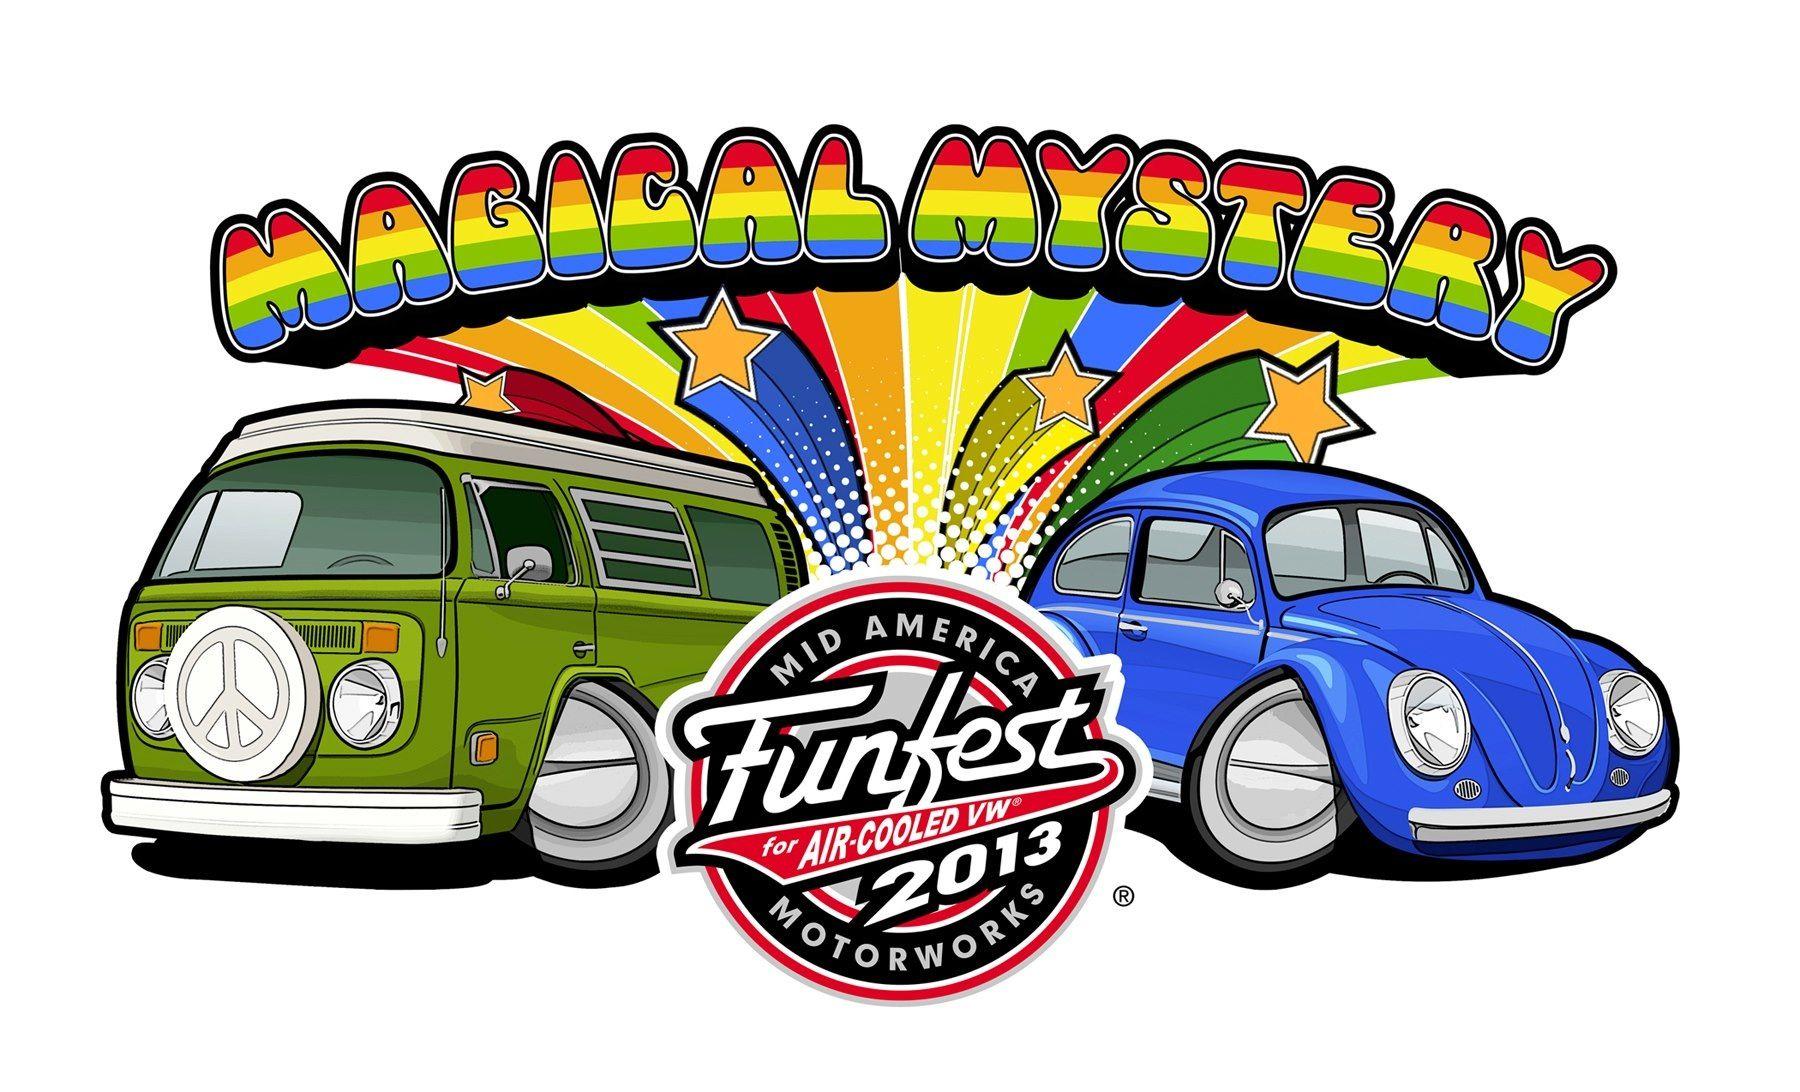 VW Funfest at Mid America Motorworks funfestacvw